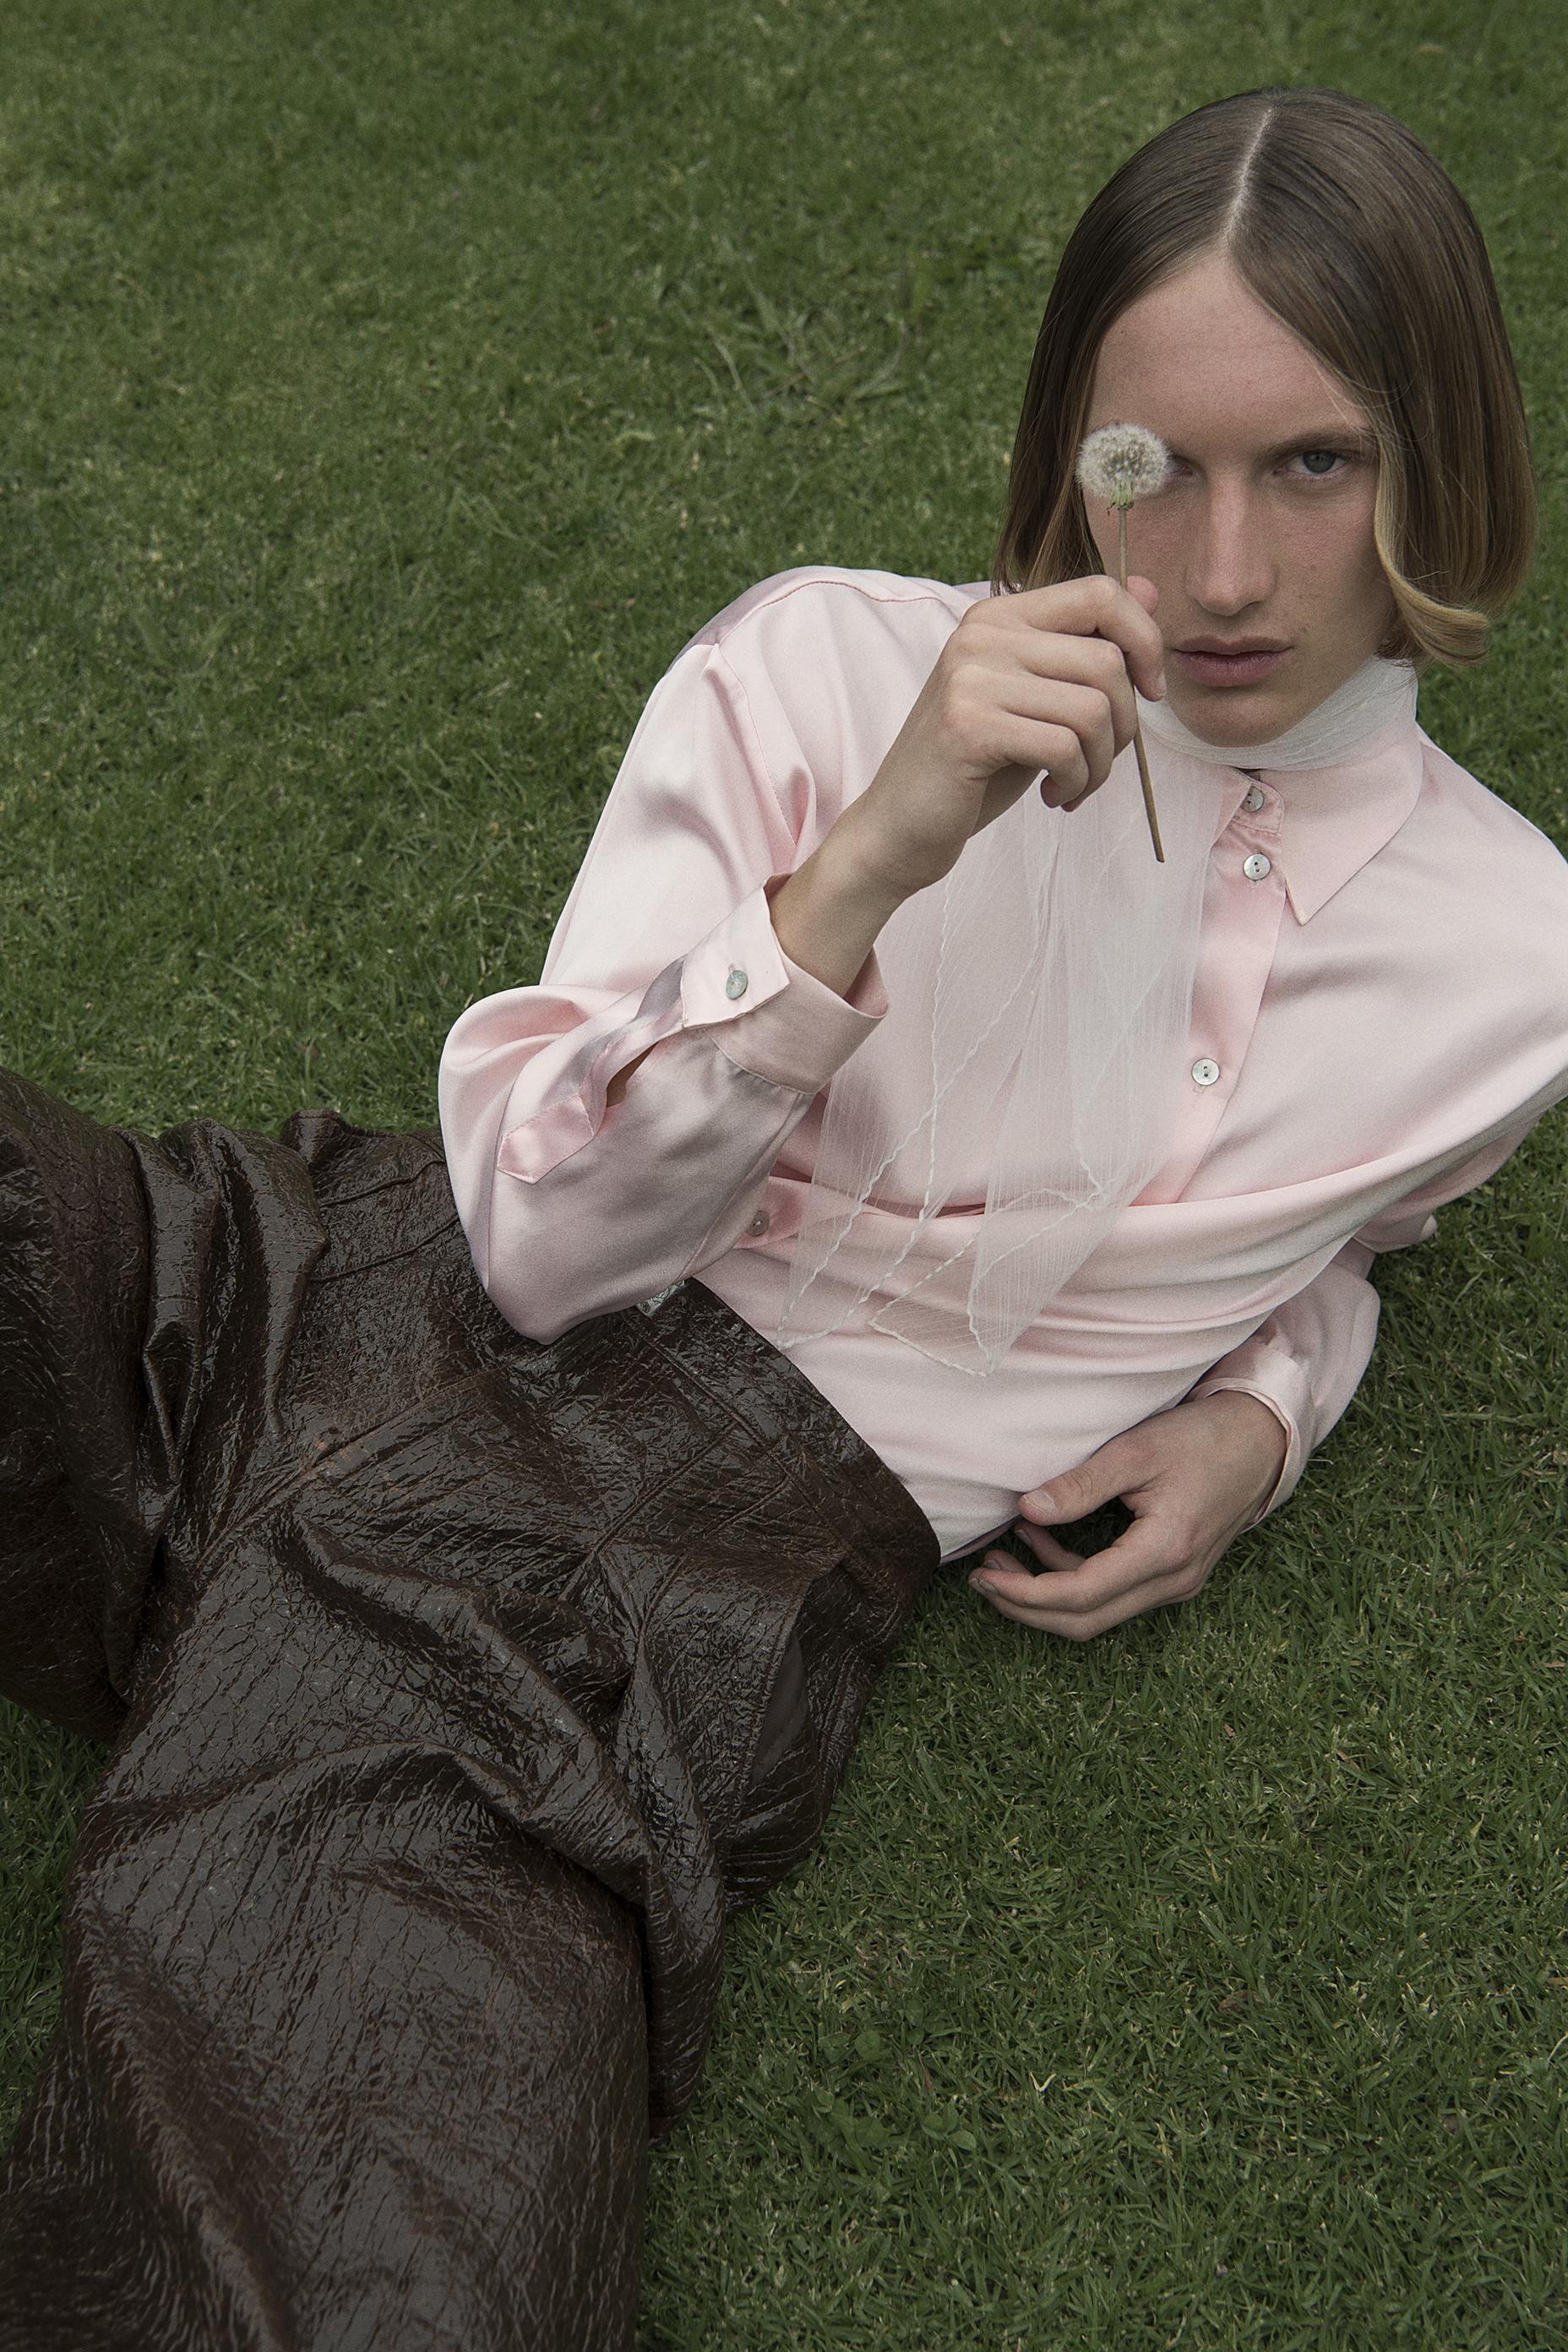 crocodile pants +scarf  stylists own  silk shirt  vintage  pants  alexandra peters